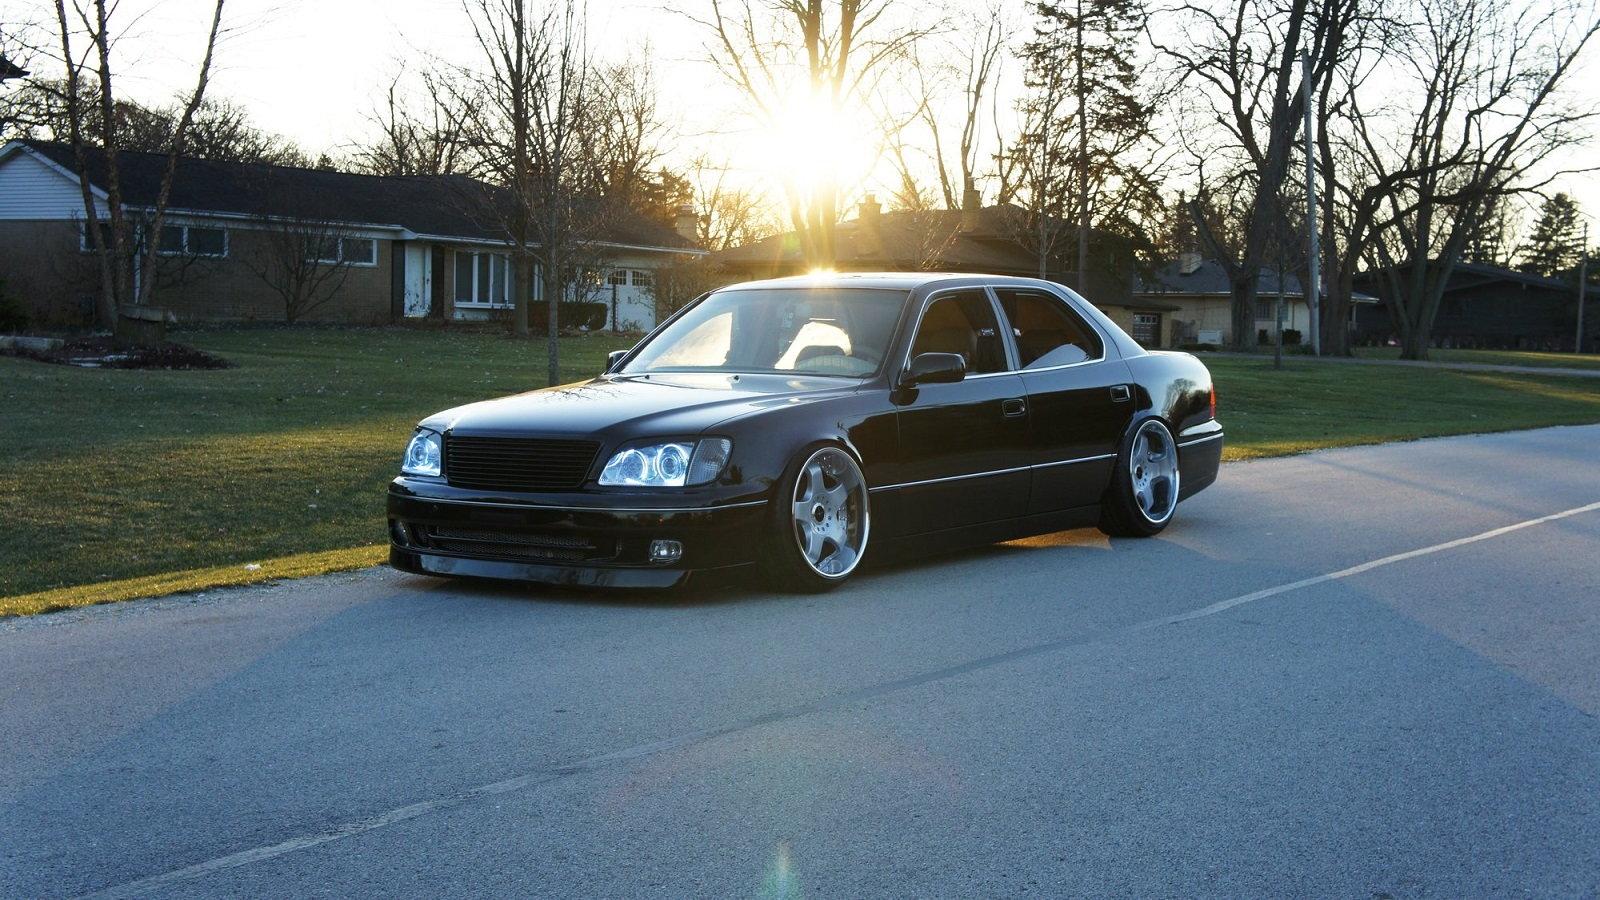 Build A Lexus >> Lexus Ls400 Build Looks Bad In Black Clublexus